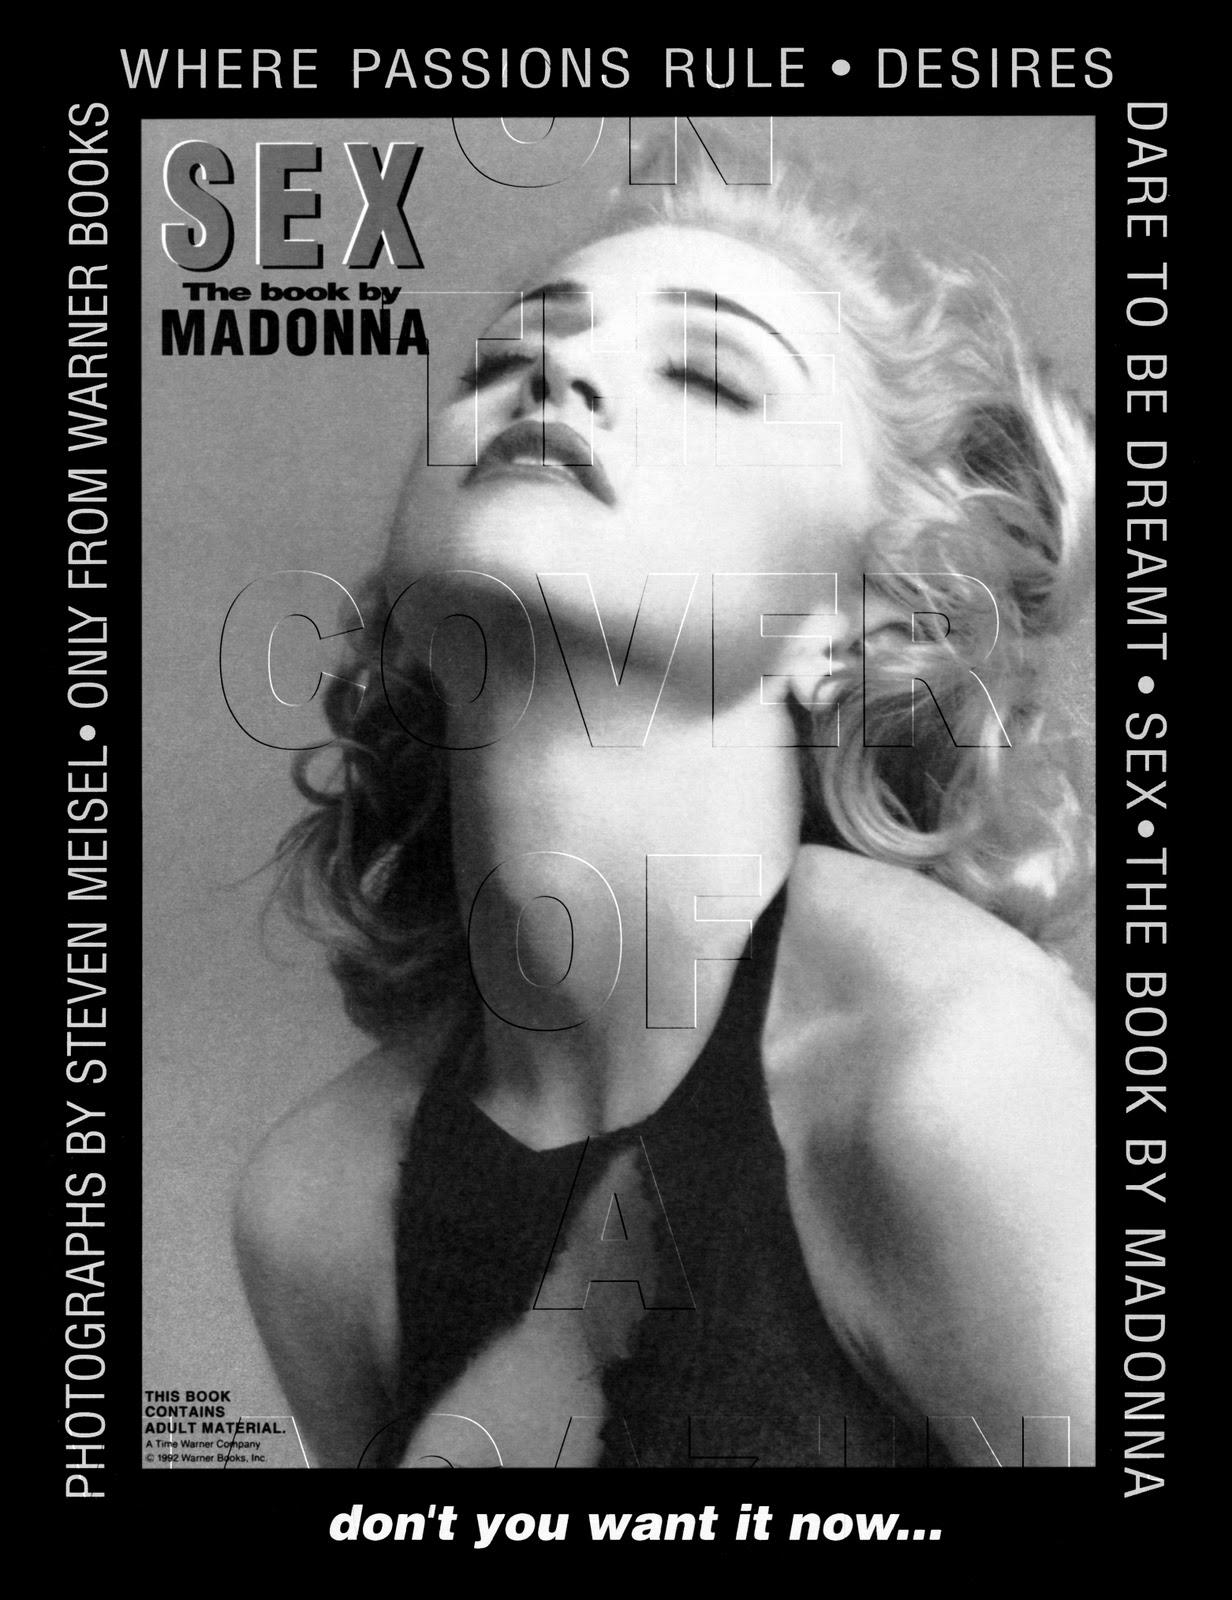 Madonna sex book scans, korean women nude young